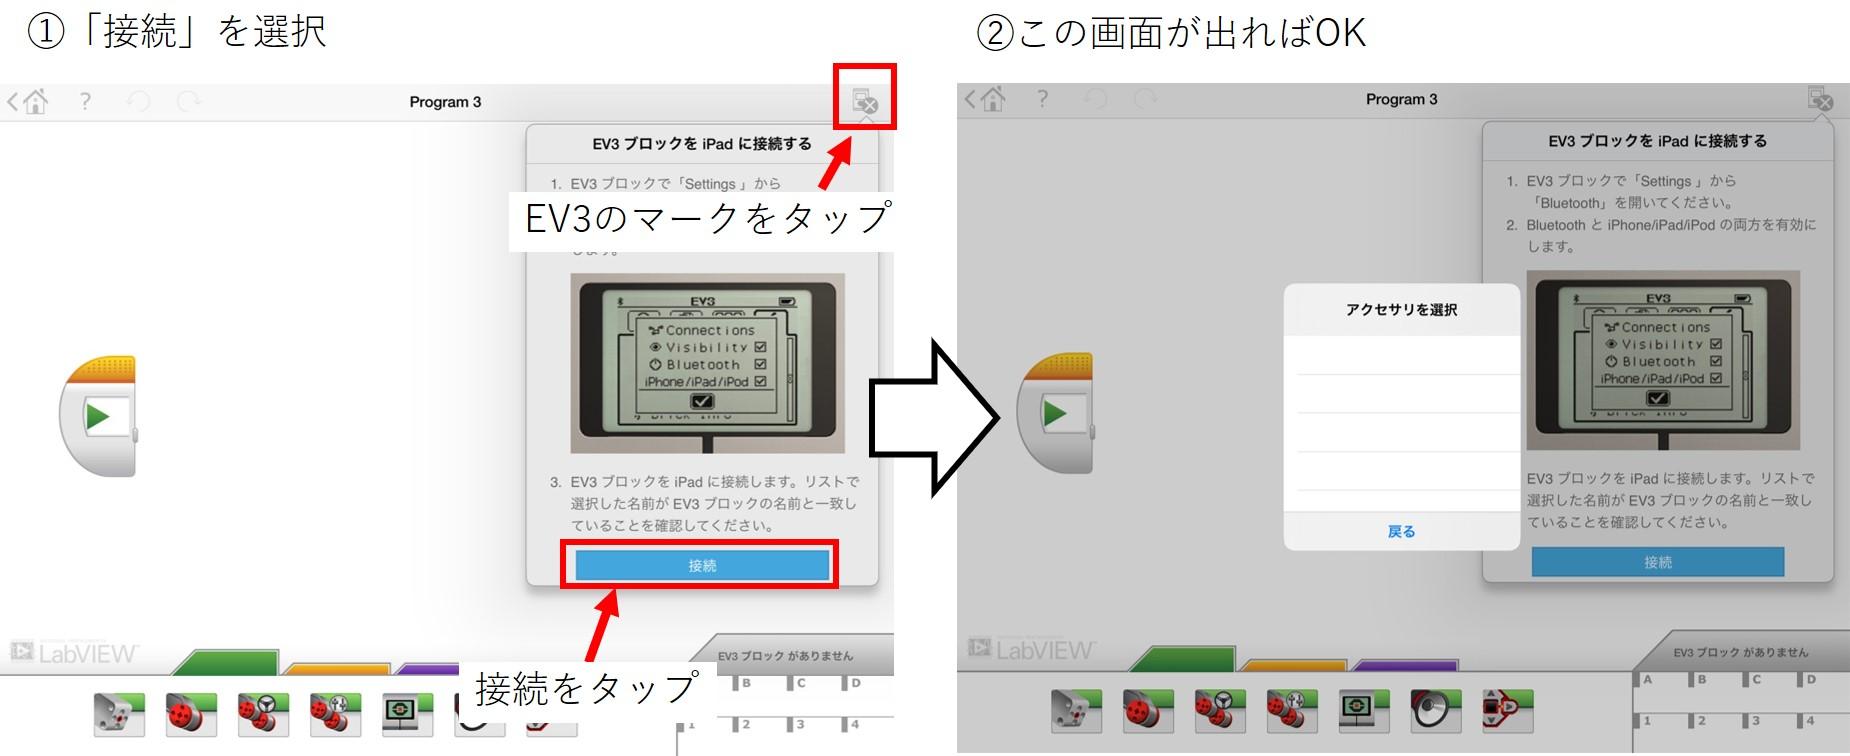 bluetooth_setsuzoku1.jpg